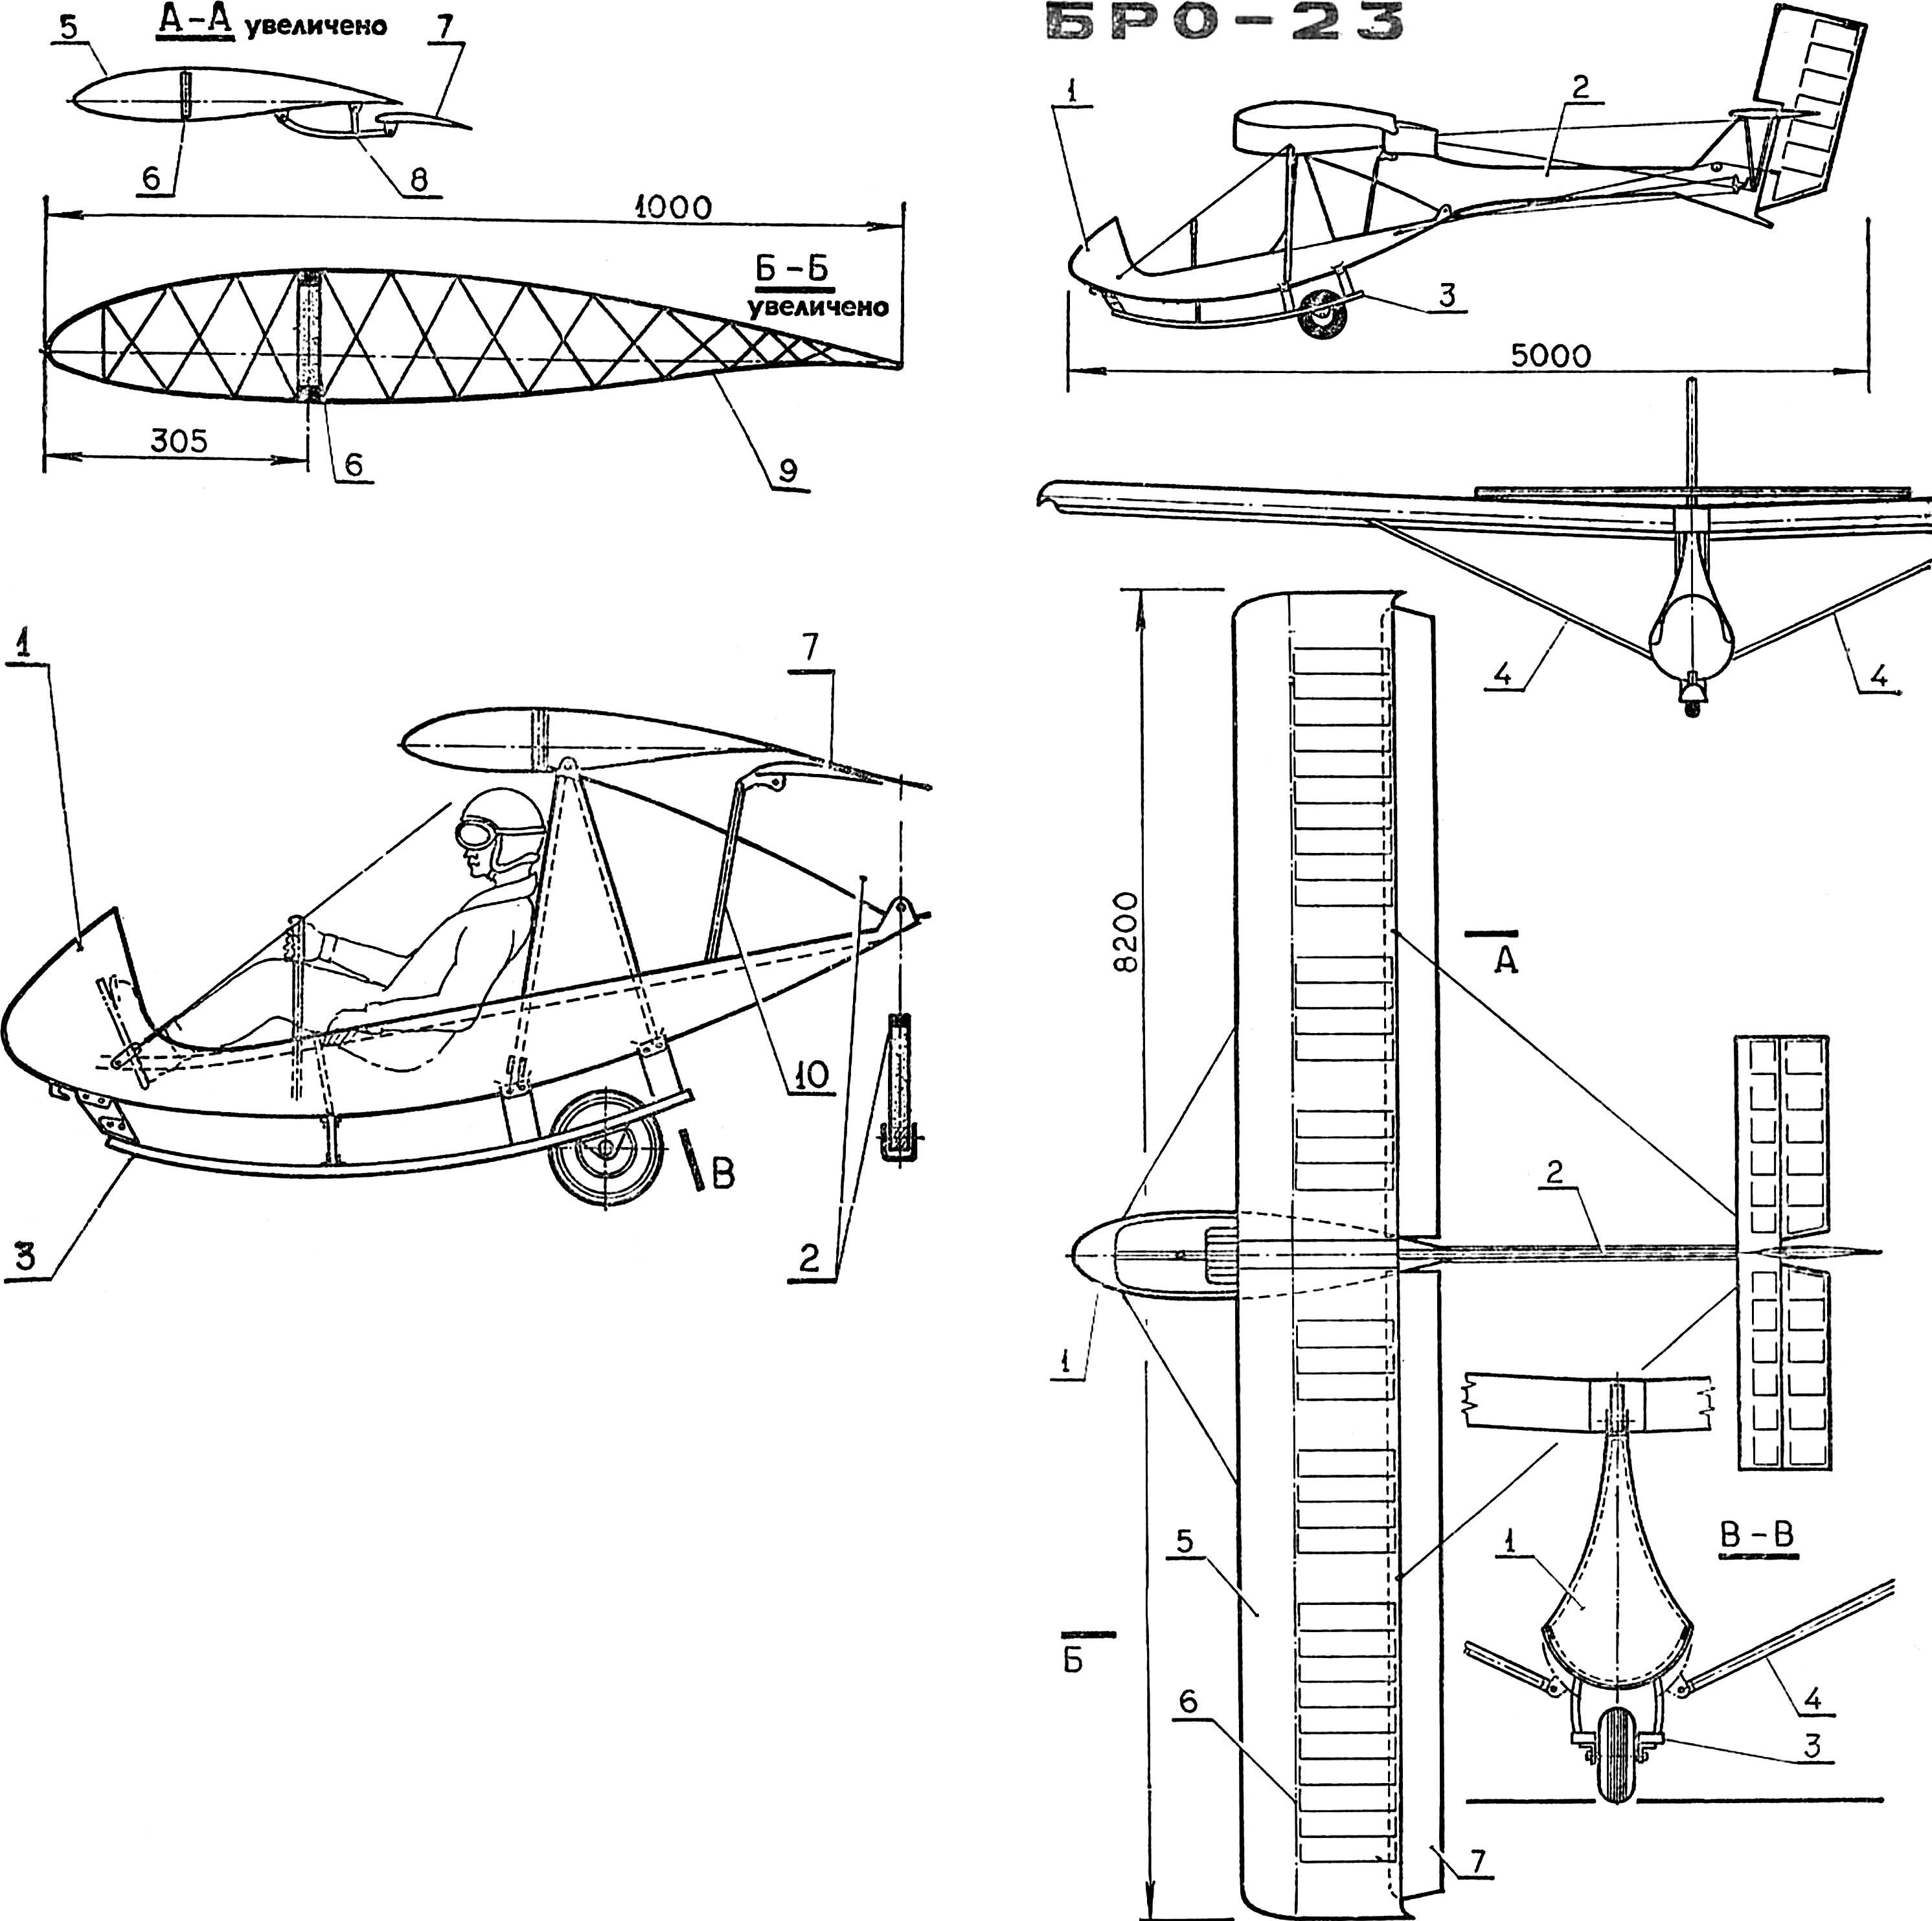 Планер БРО-23 конструкции Б. Ошкиниса.